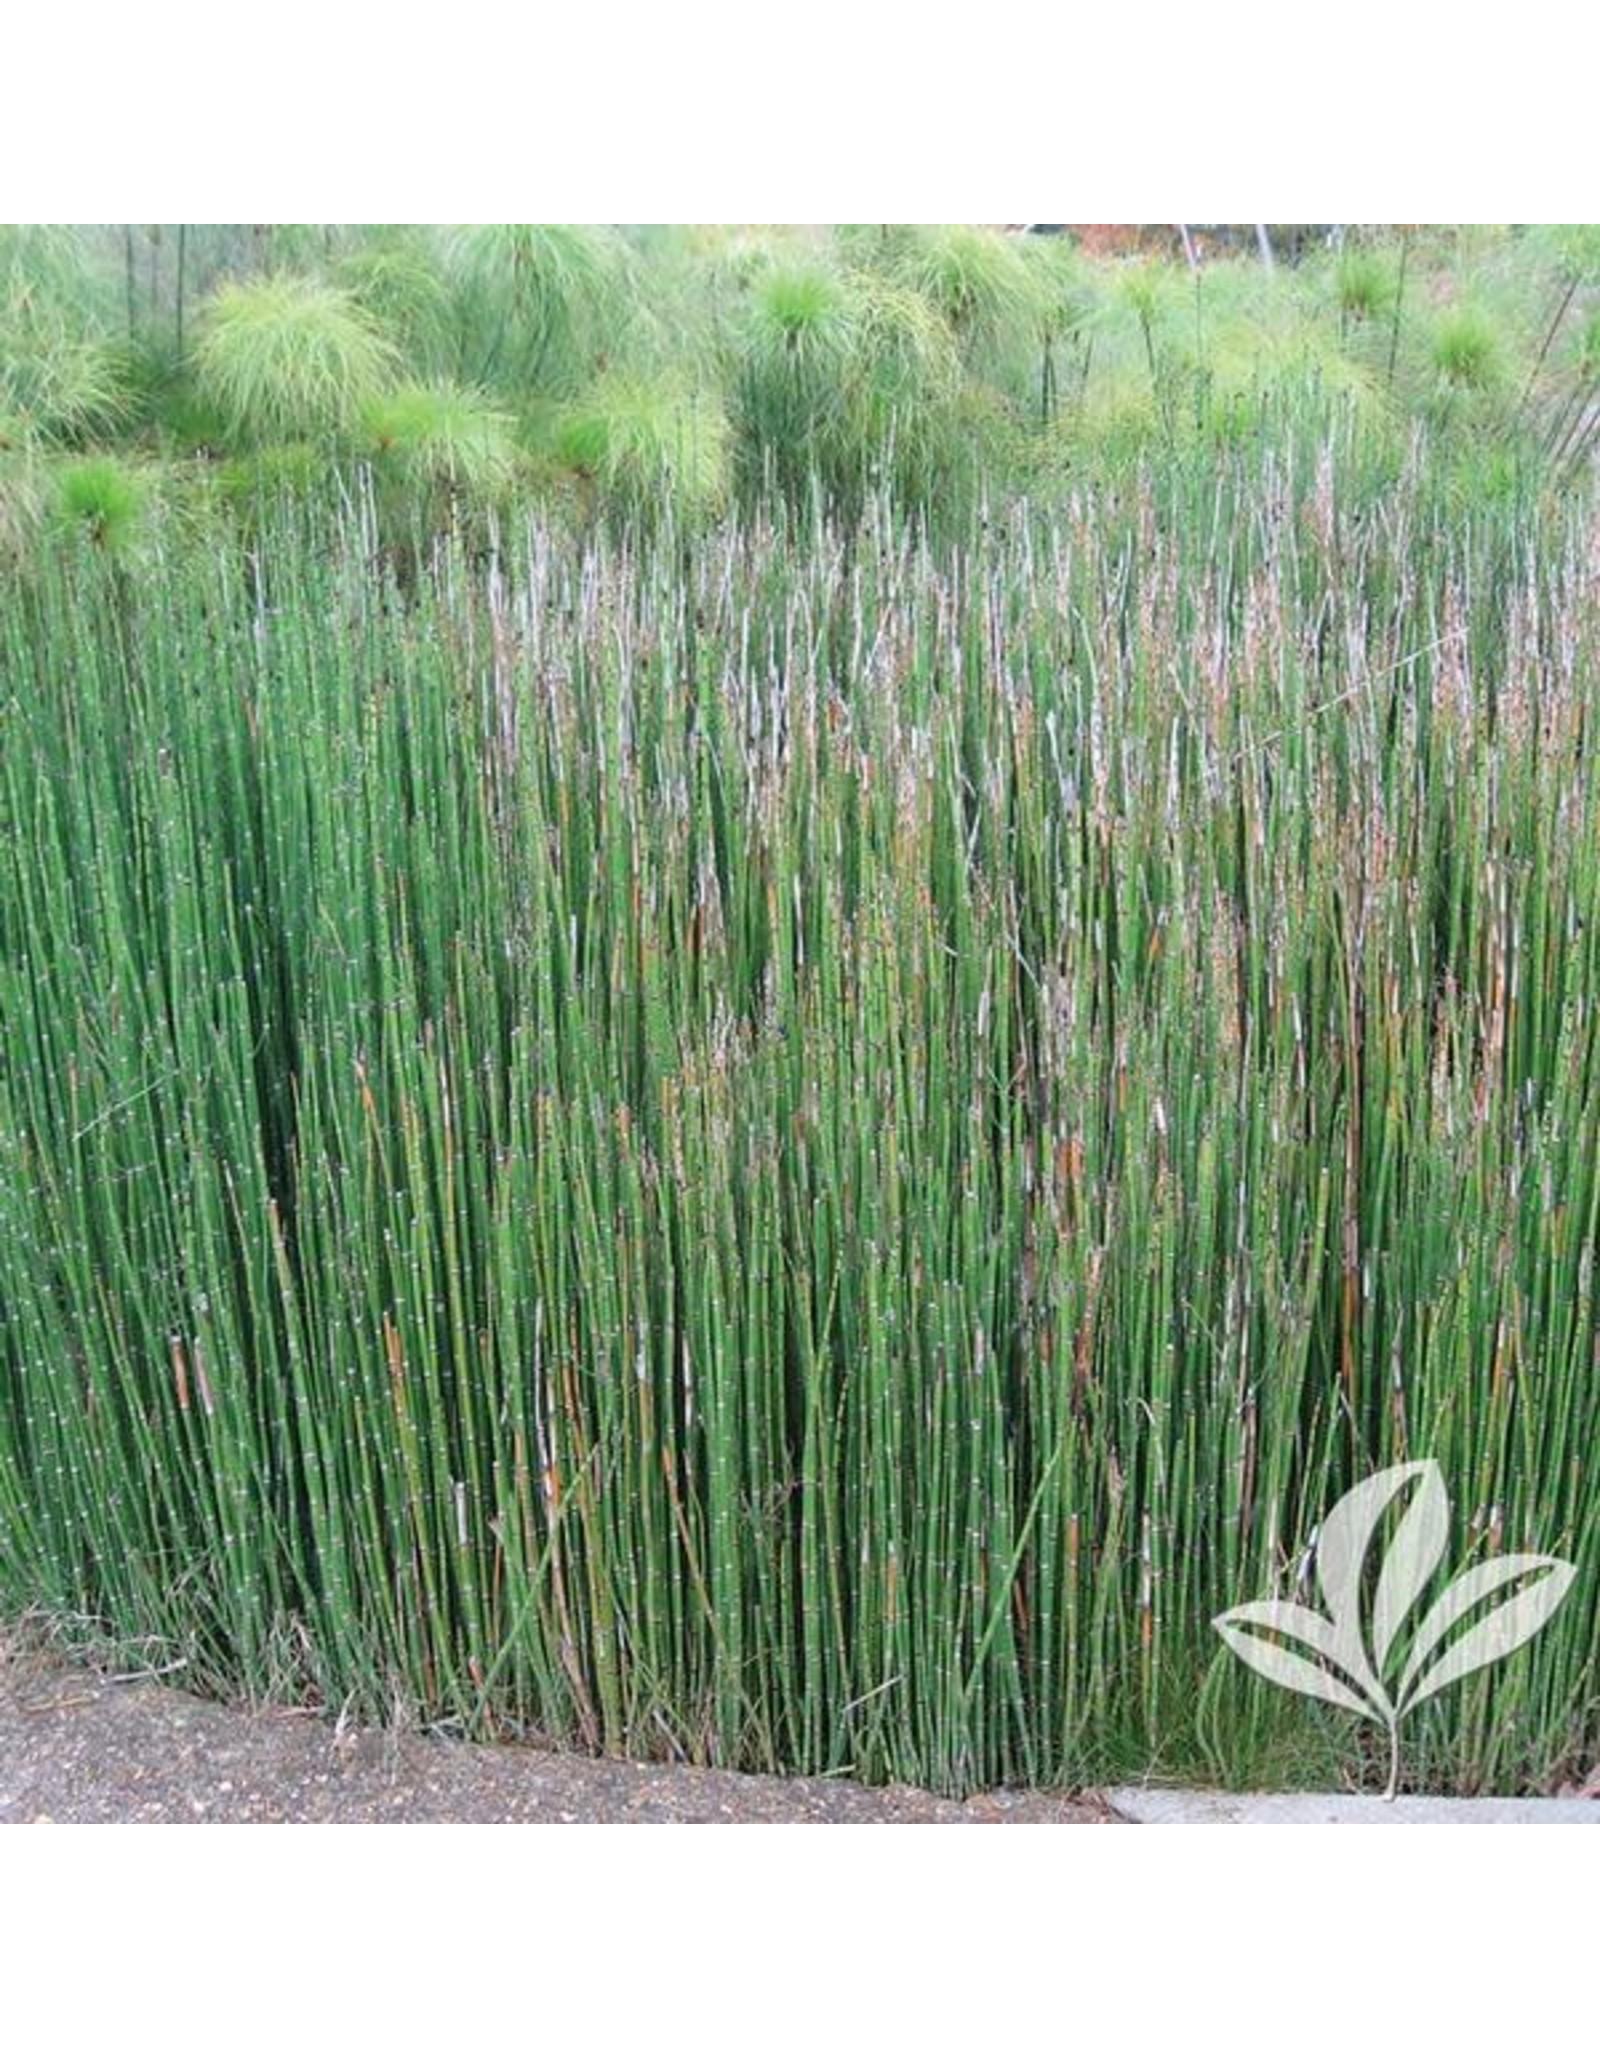 Horsetail Reed - 1 Gallon